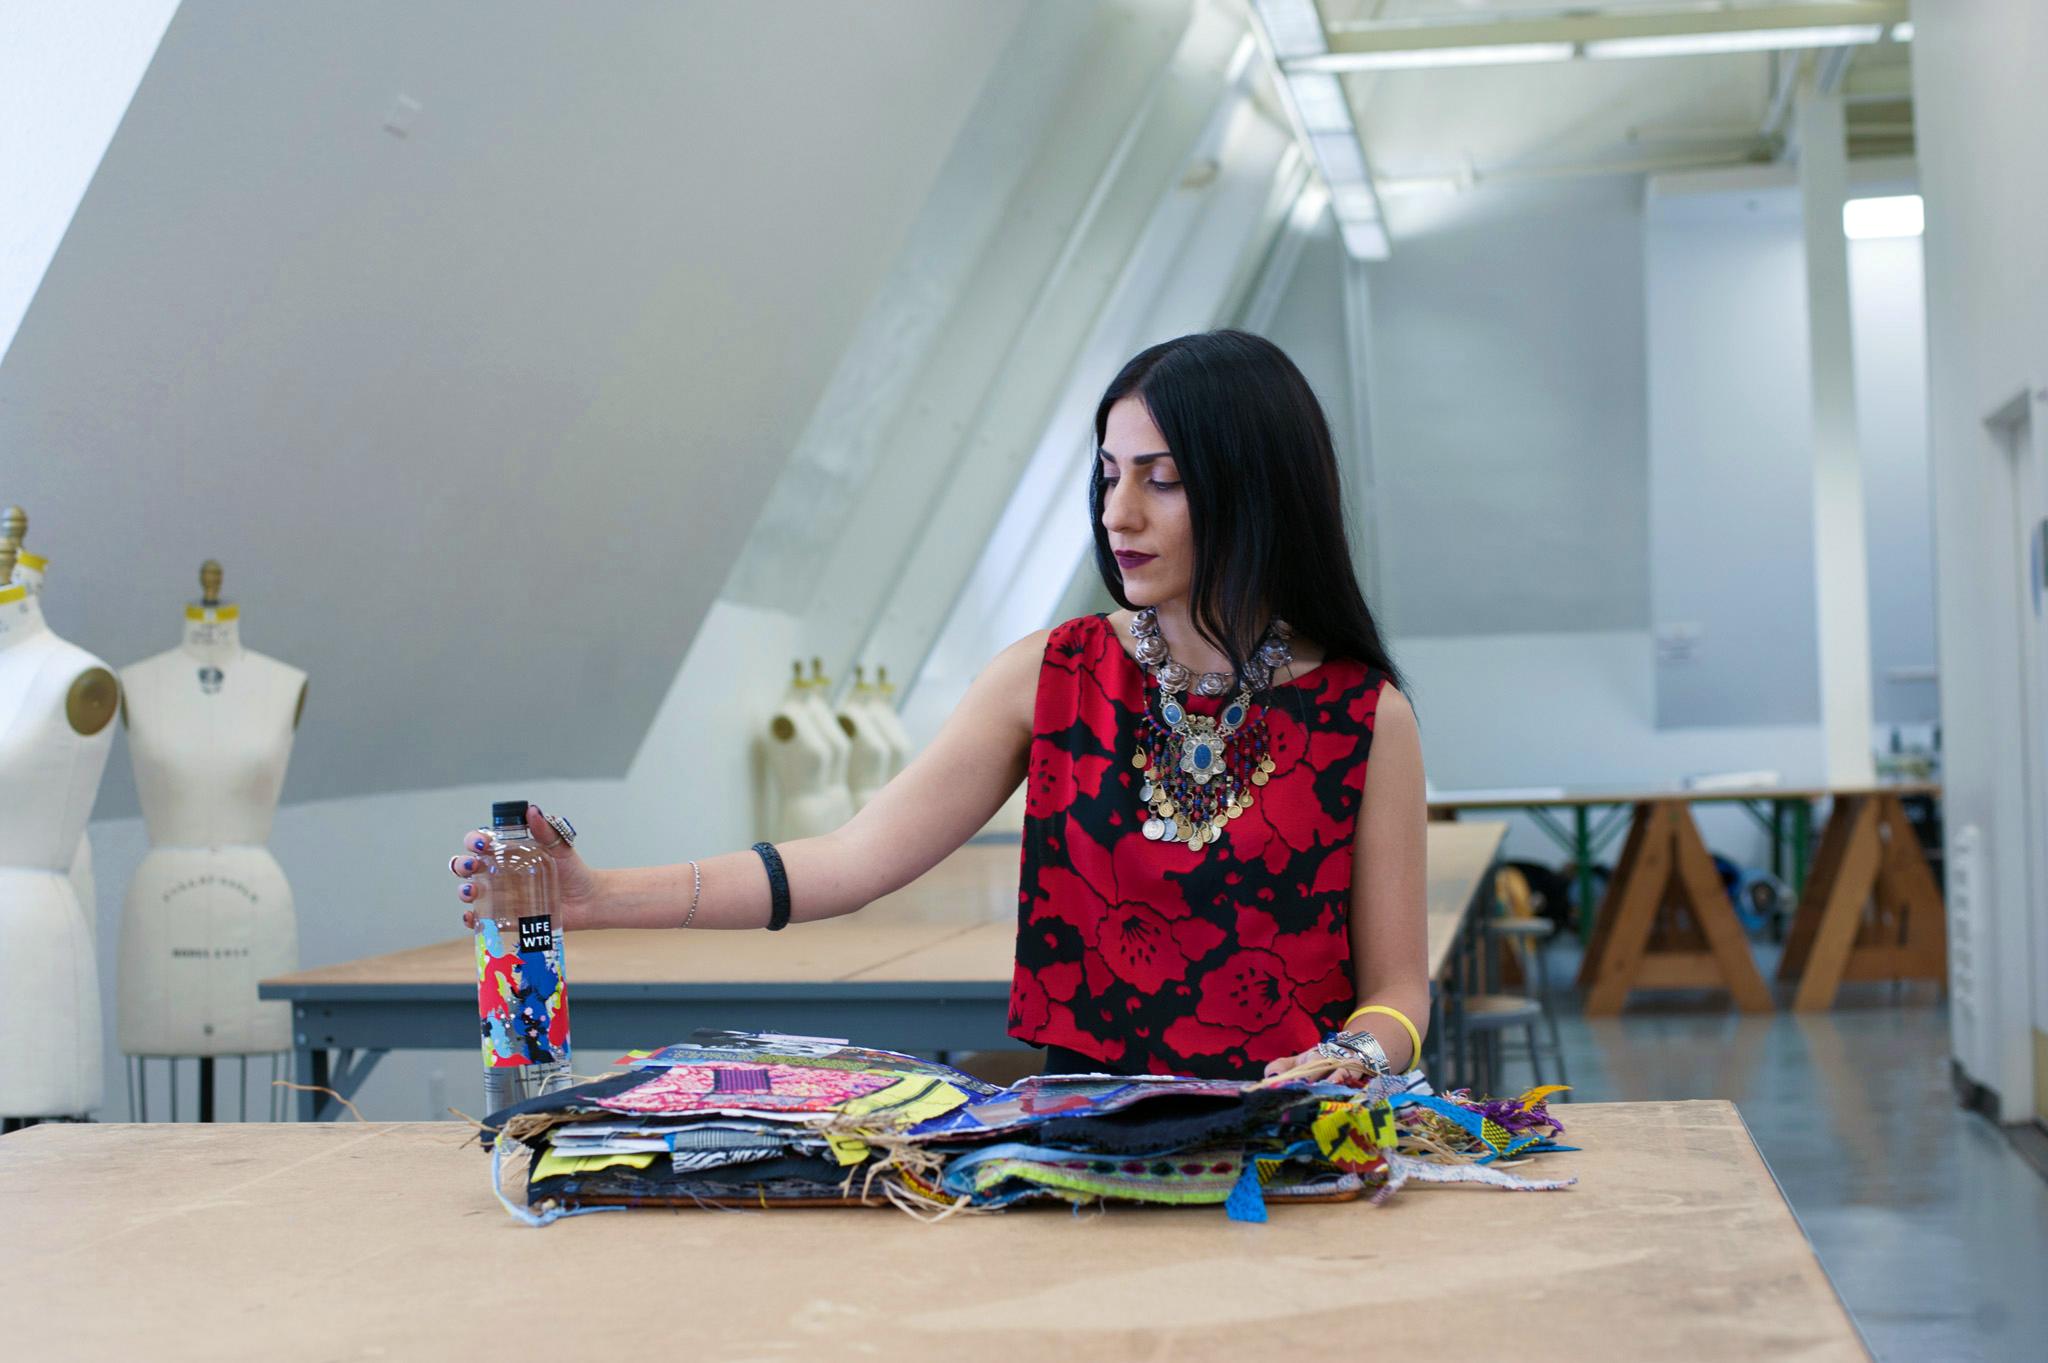 LIFEWTR Series 3 Artist Ghazaleh Khalifeh